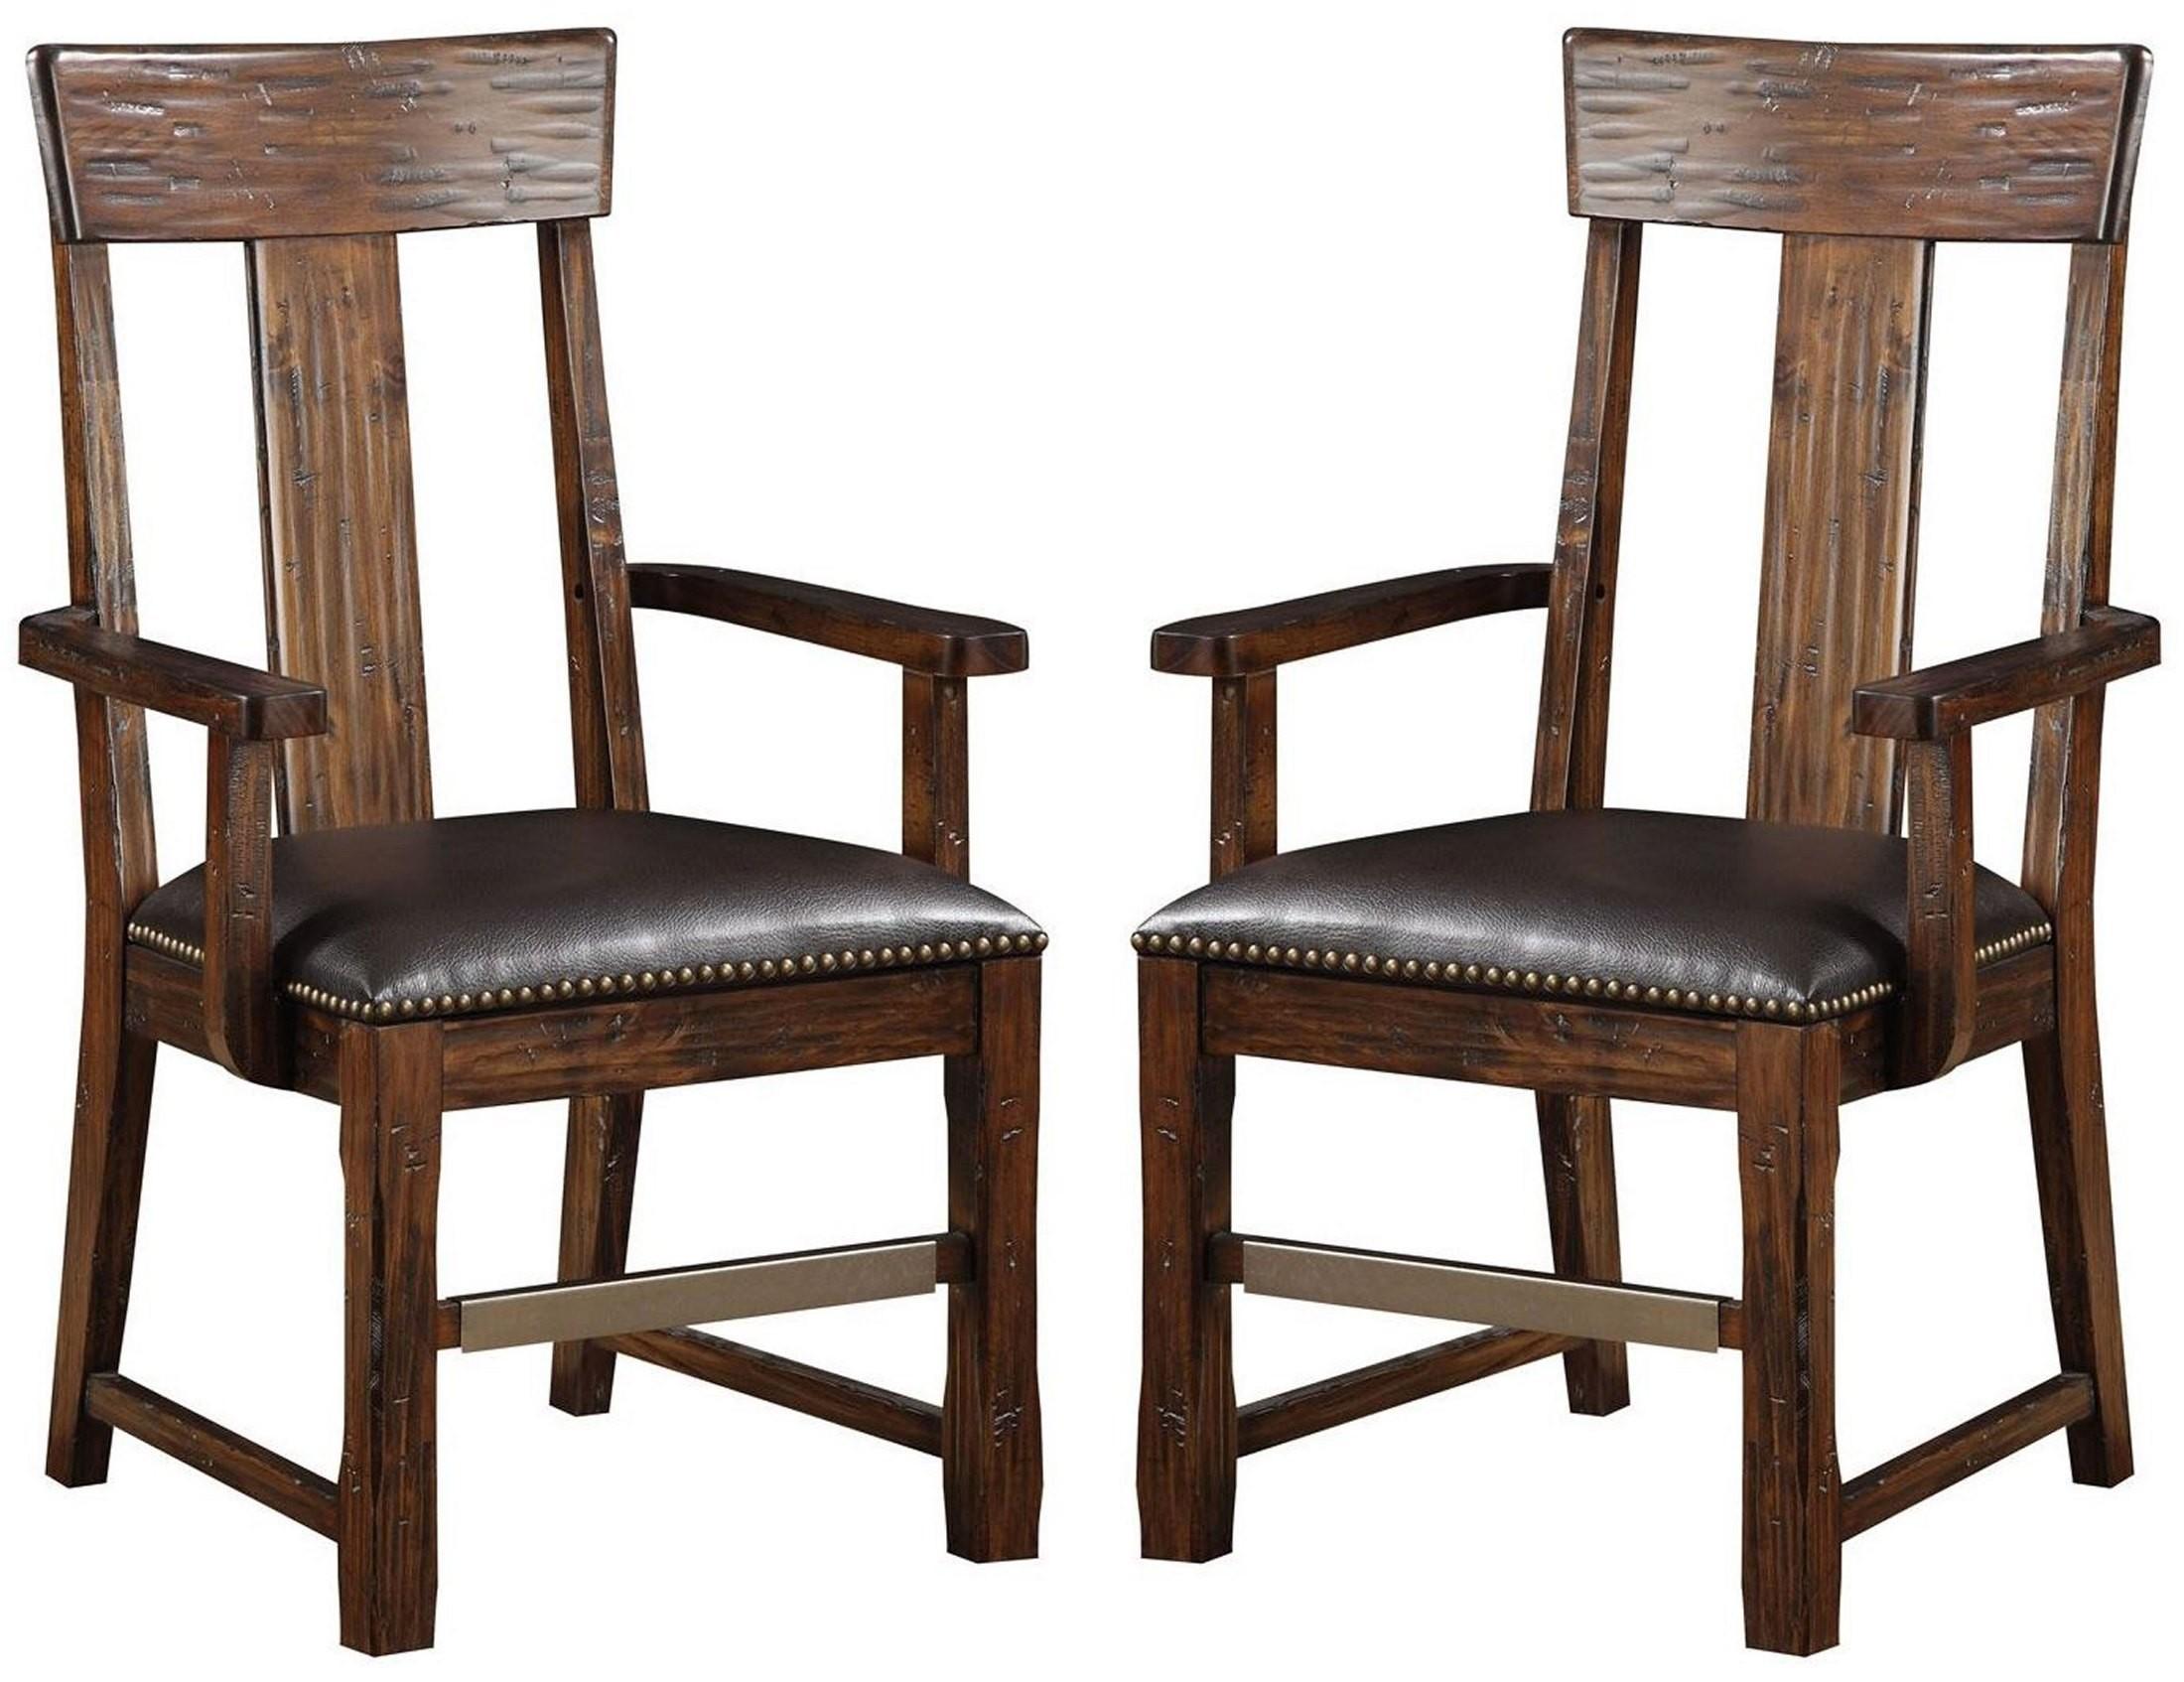 ashland brown splat back arm chair set of 2 d349 21 2pk k